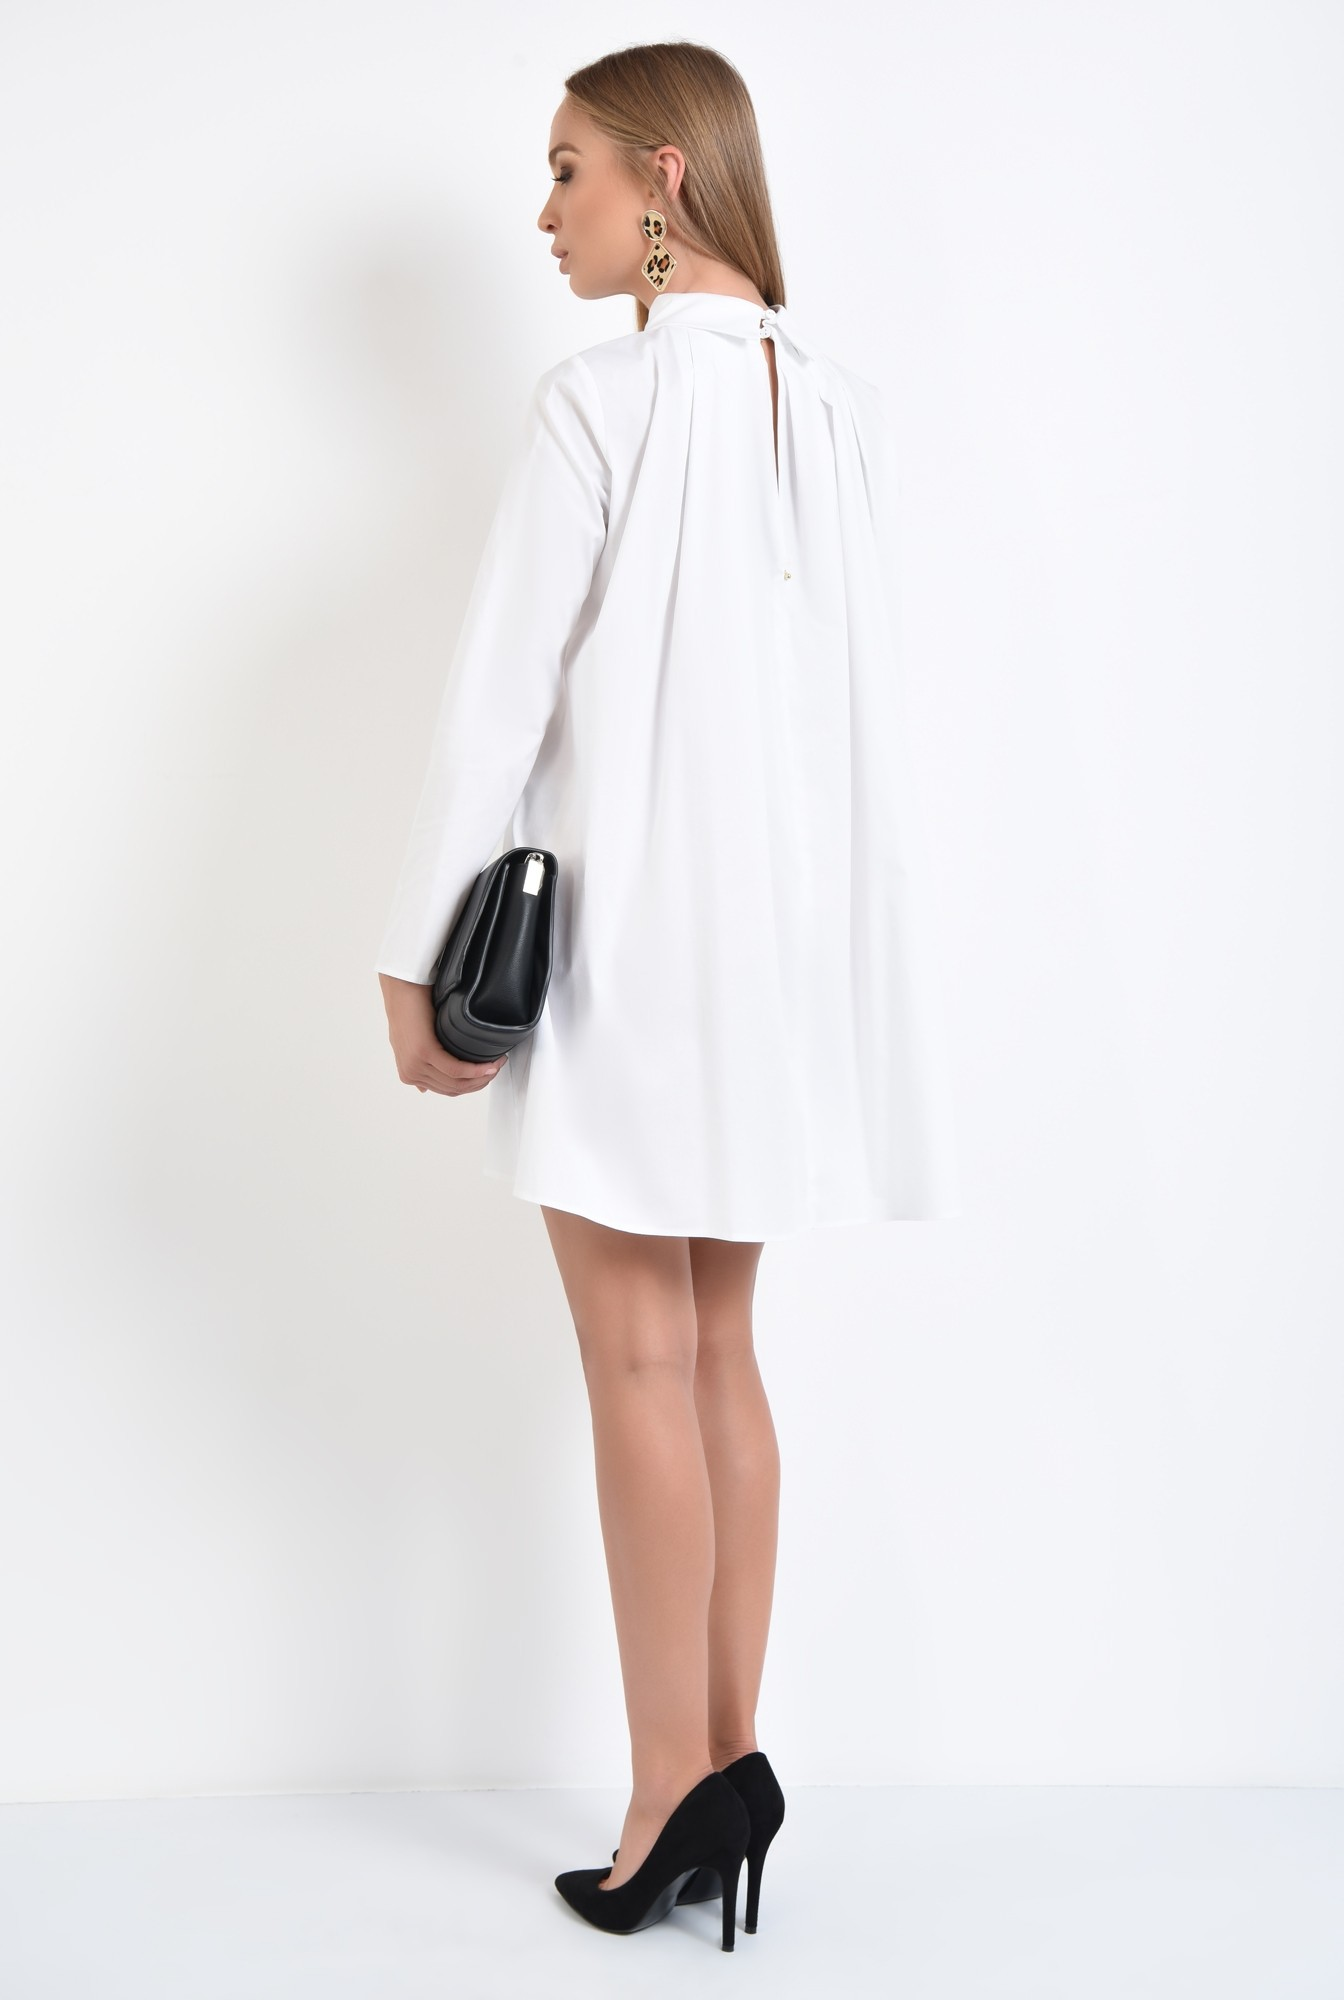 1 - rochie casual, croi lejer, pliuri, guler aplicat, stil camasa